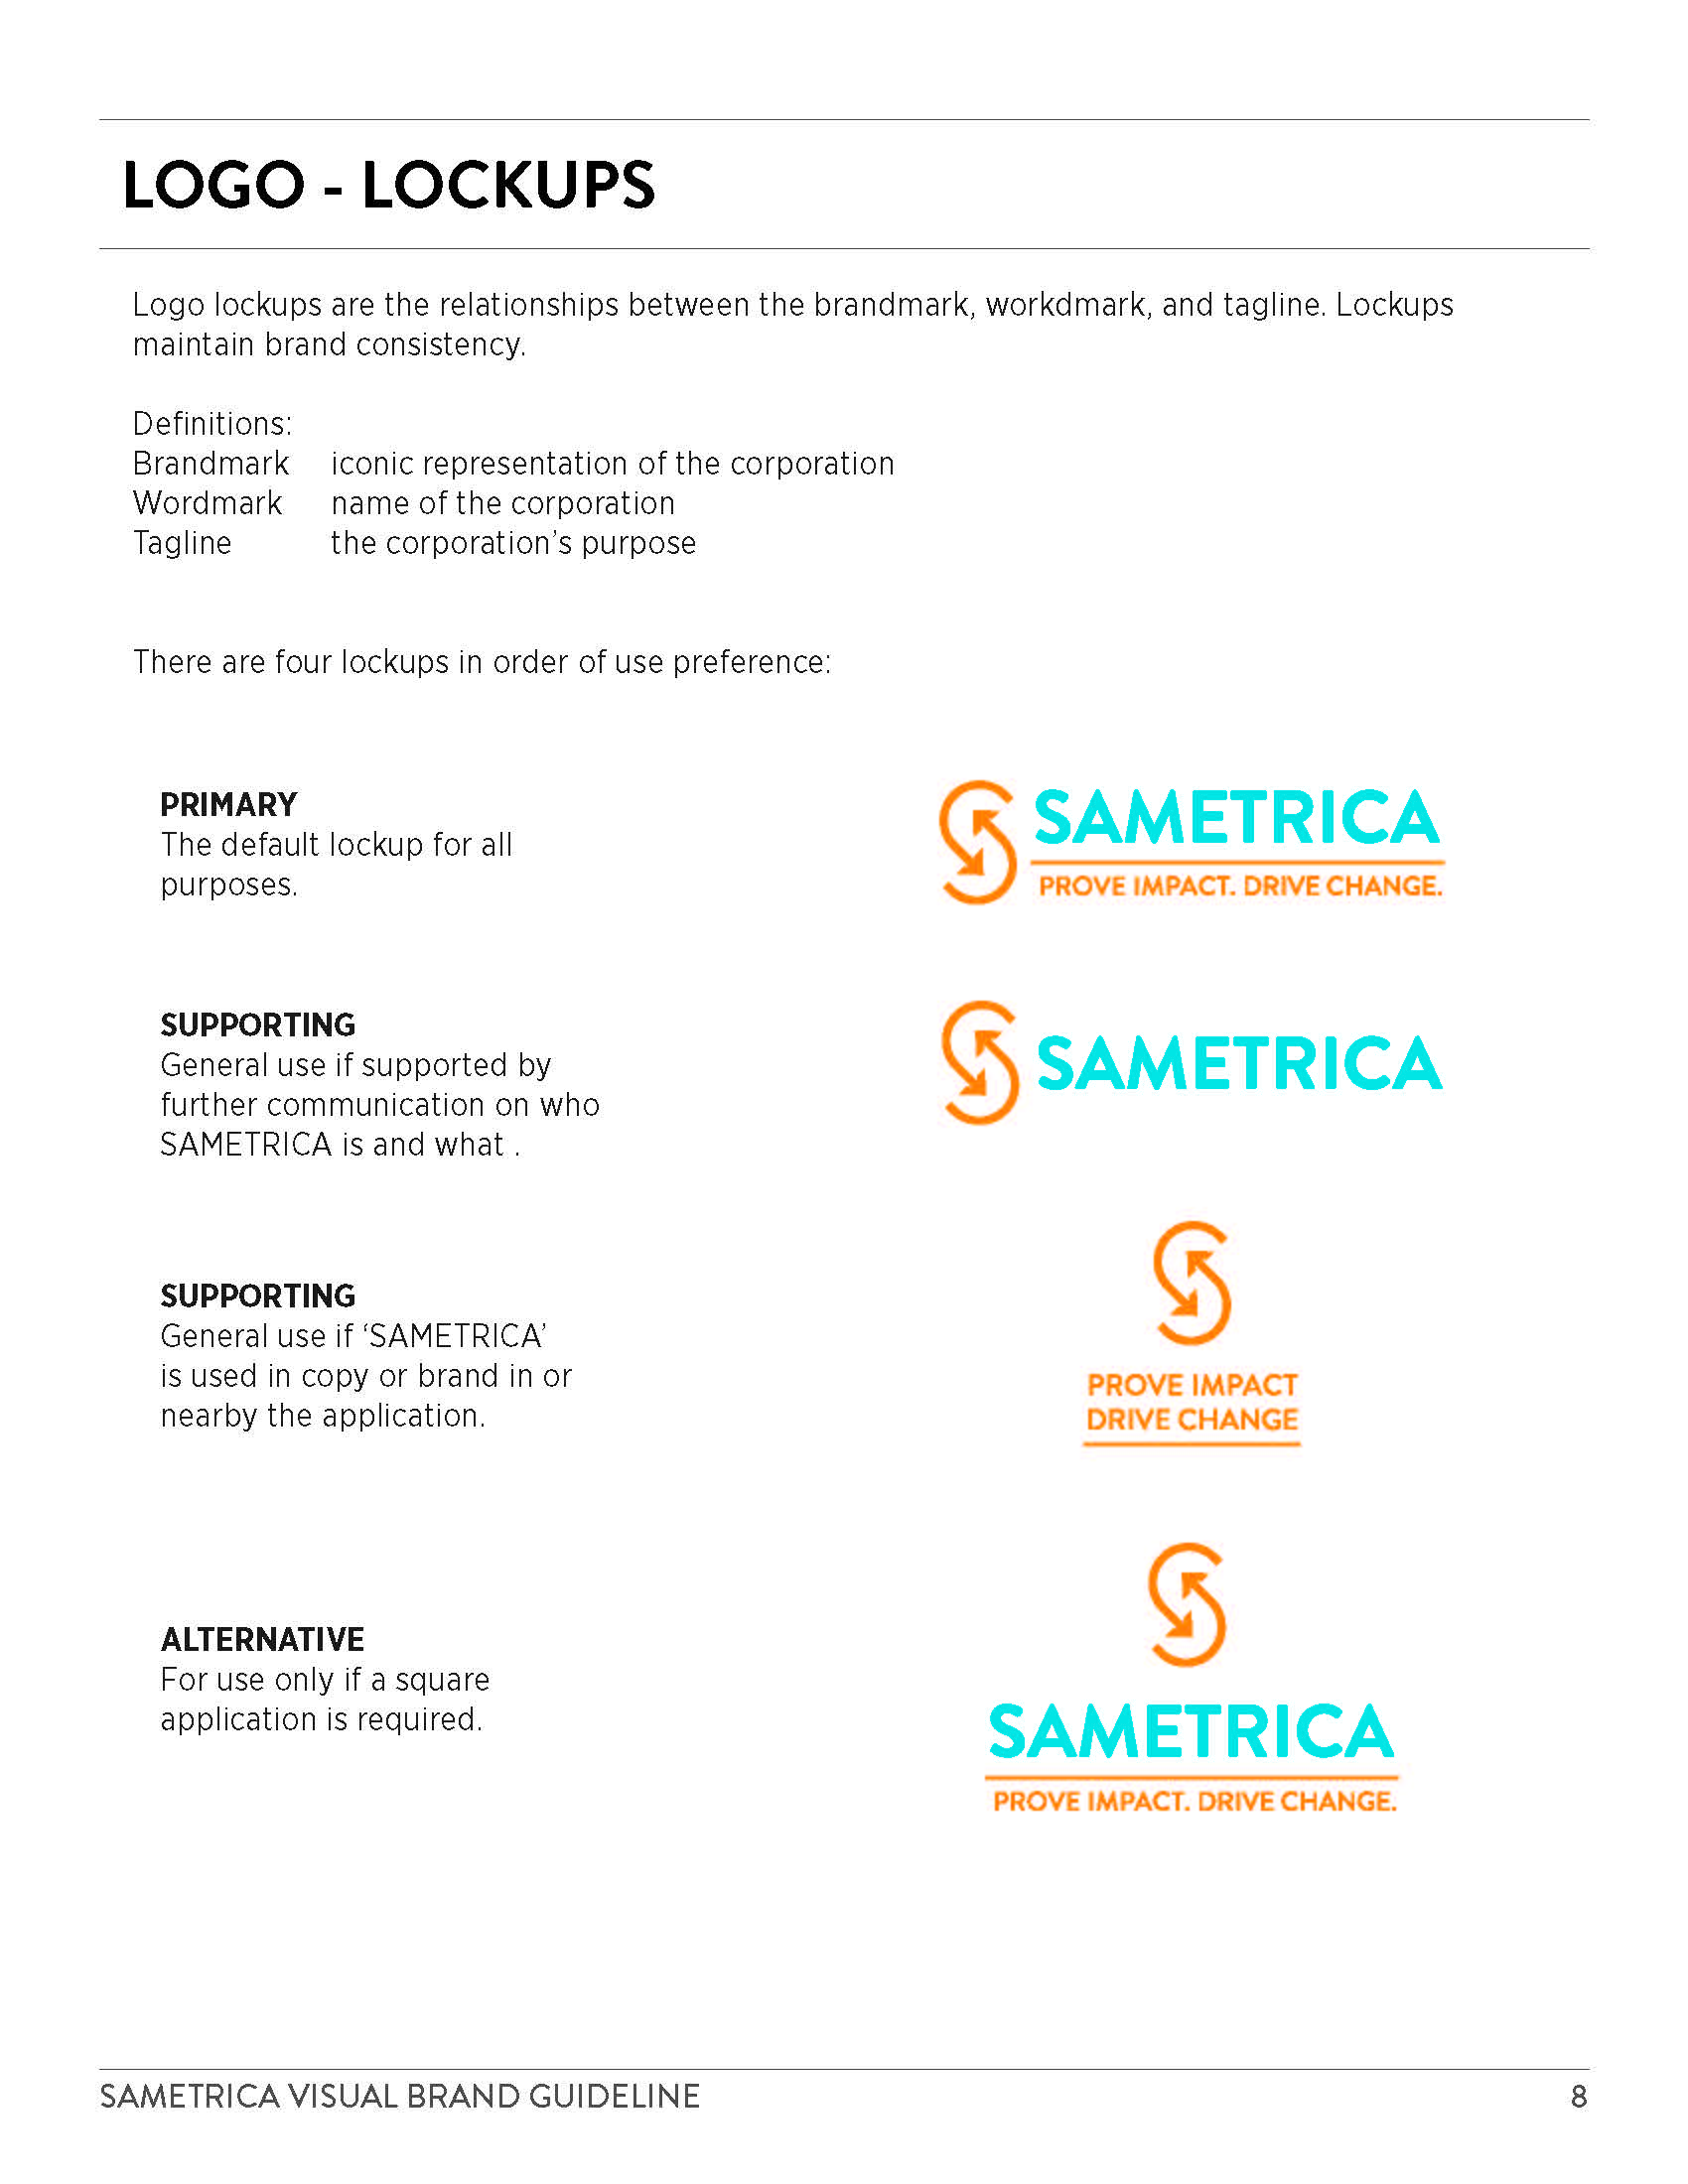 150911_SAMETRICA Brand Guideline_Page_08.jpg